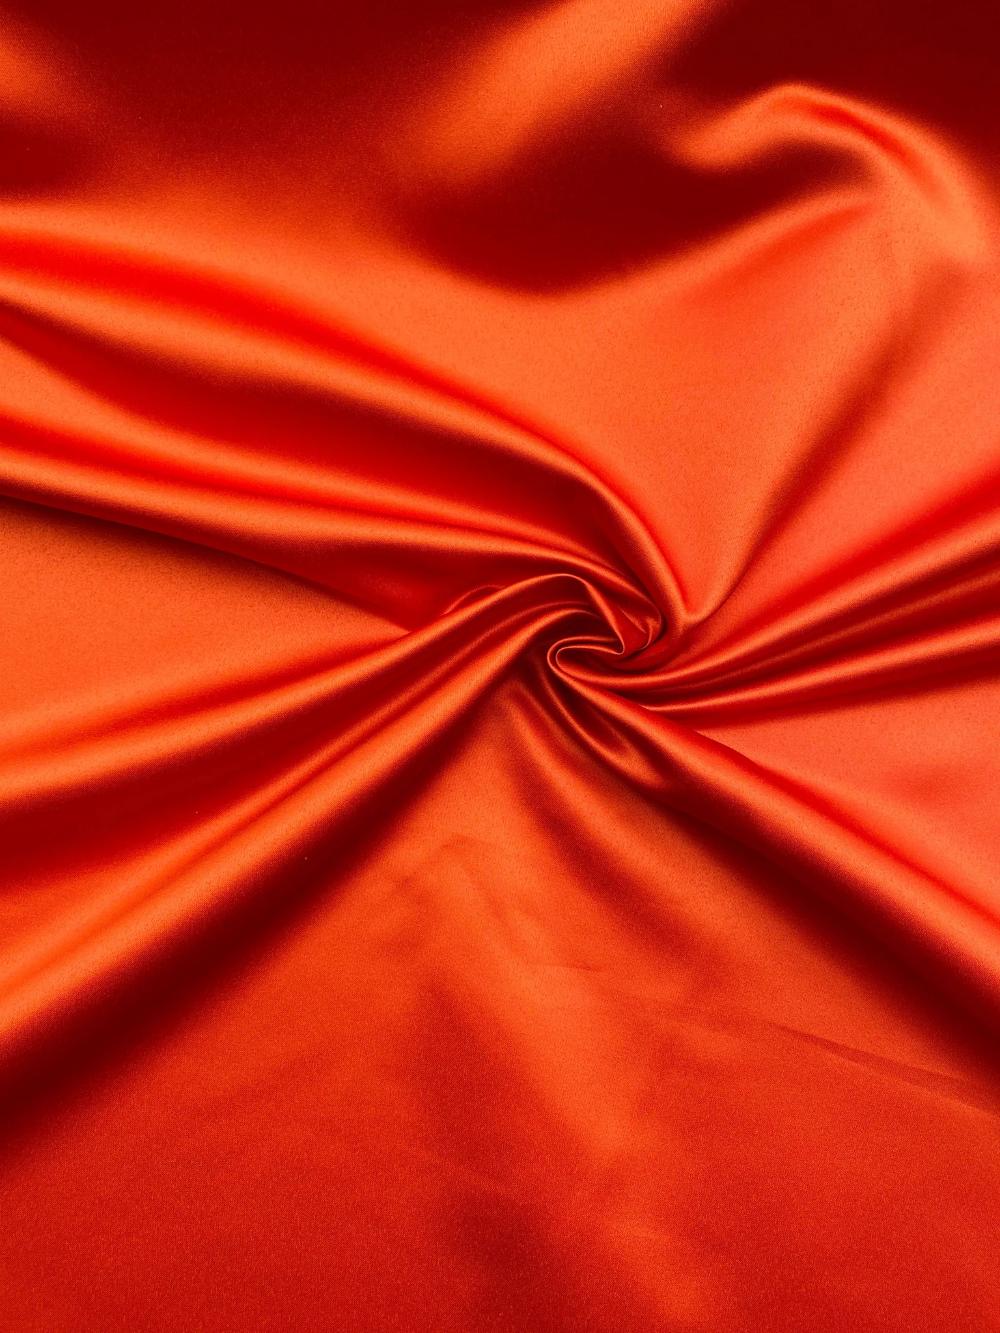 Burnt Orange Duchess Satin Fabric